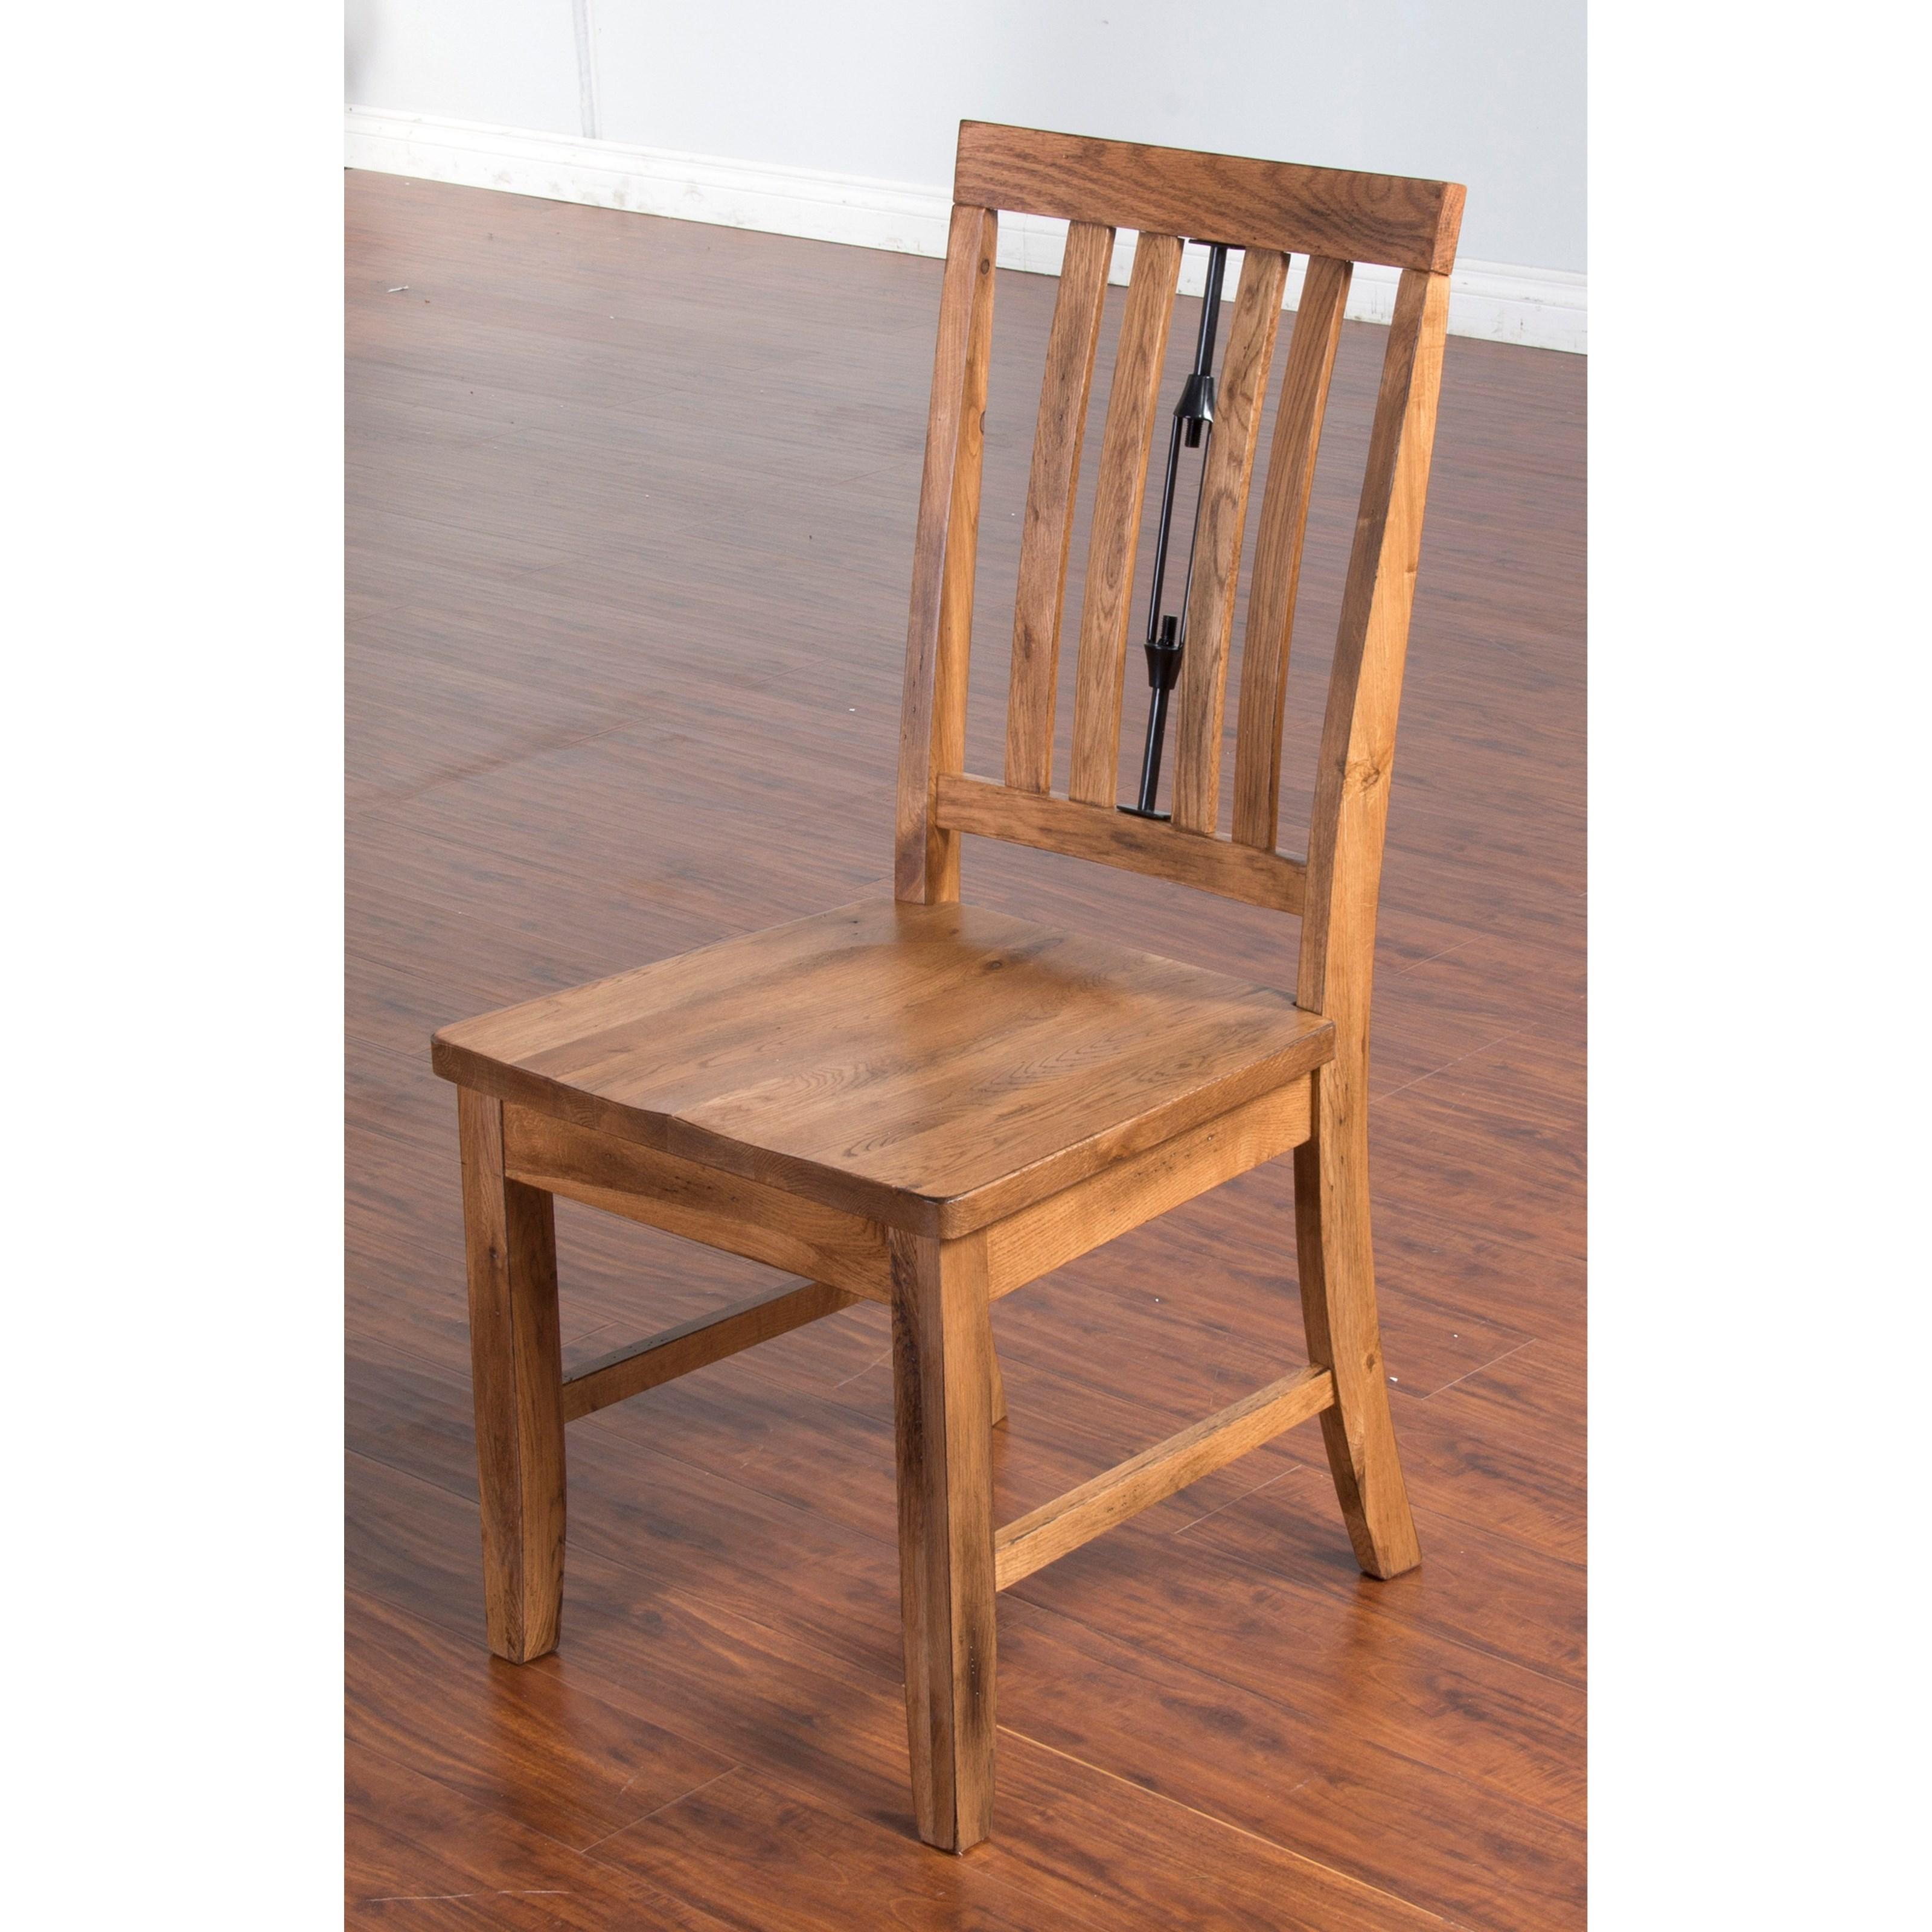 Sunny Designs Sedona Chair w/ Turn Buckle - Item Number: 1498RO